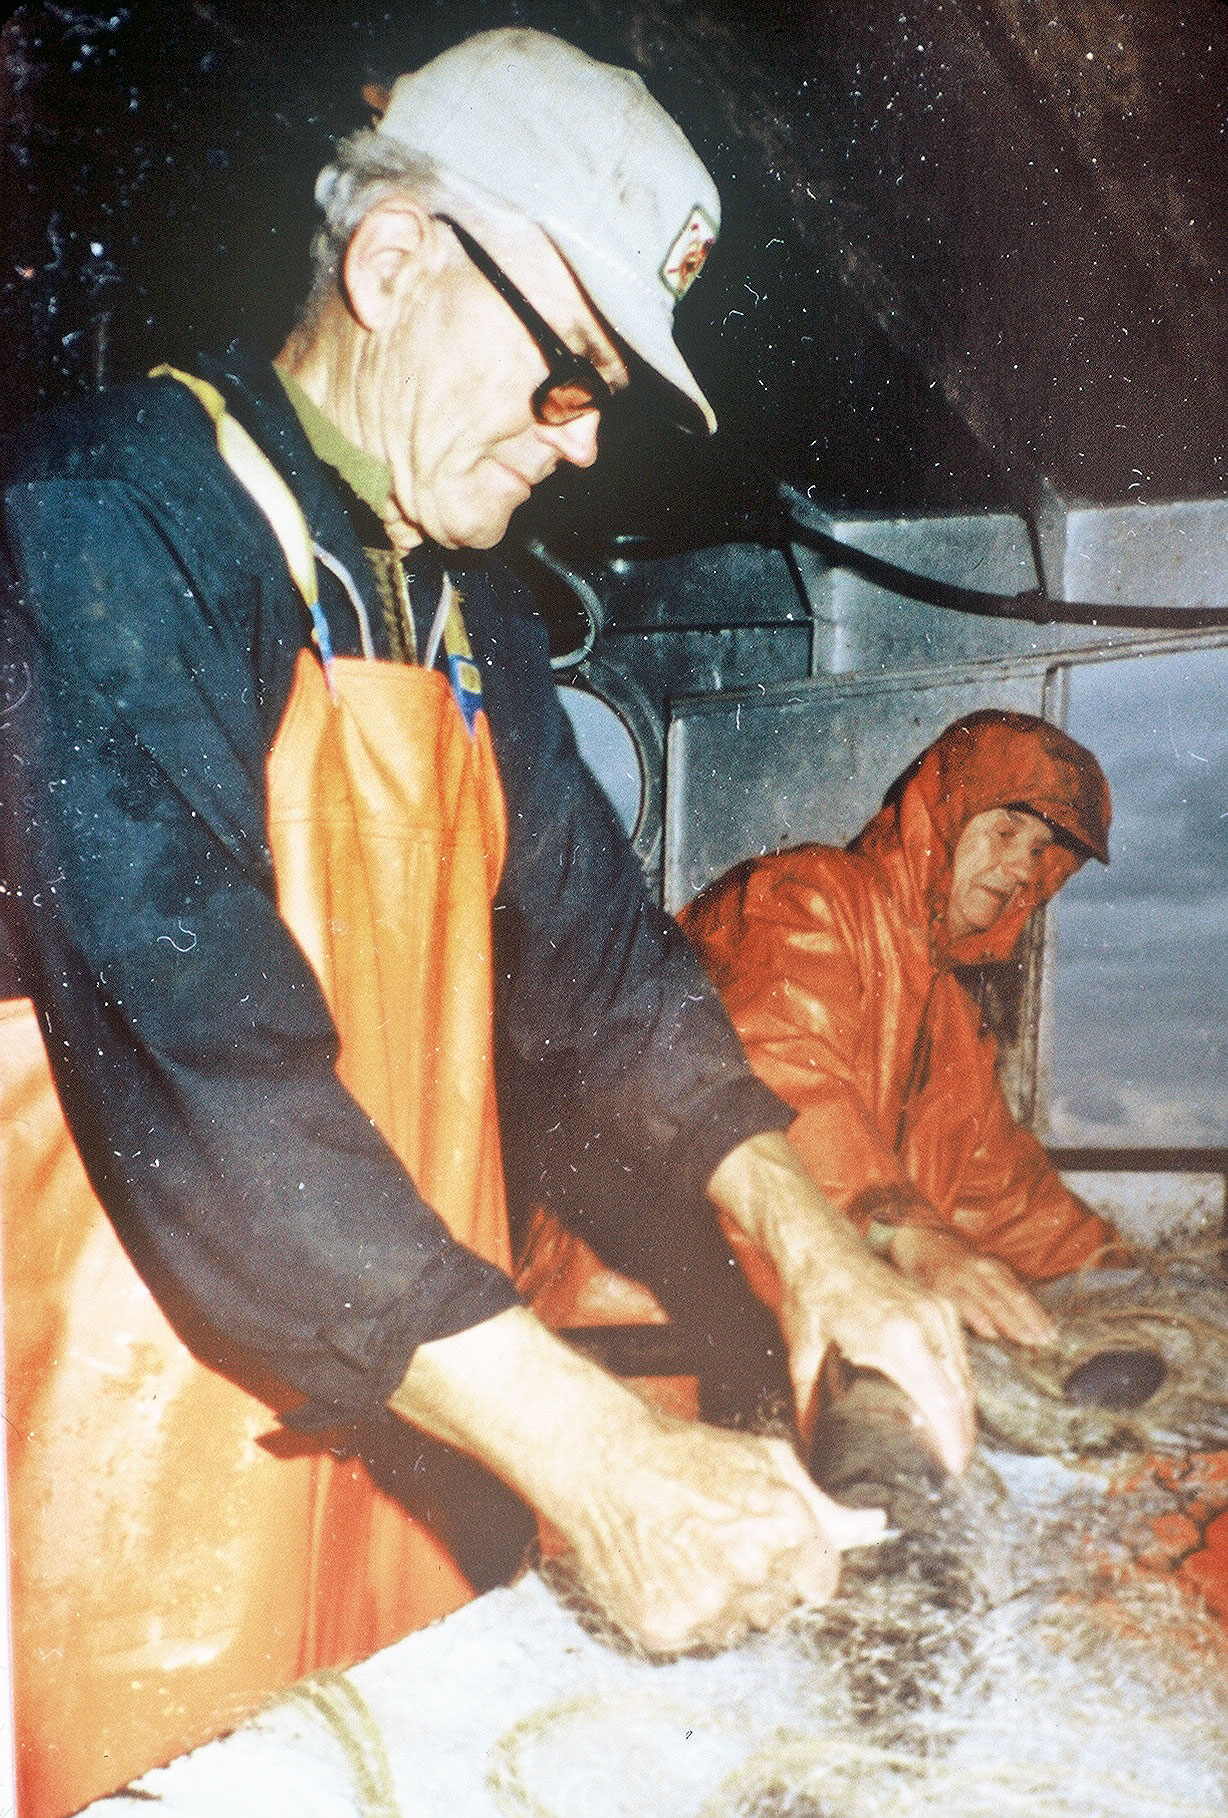 Howard & Emery Weborg sorting fish